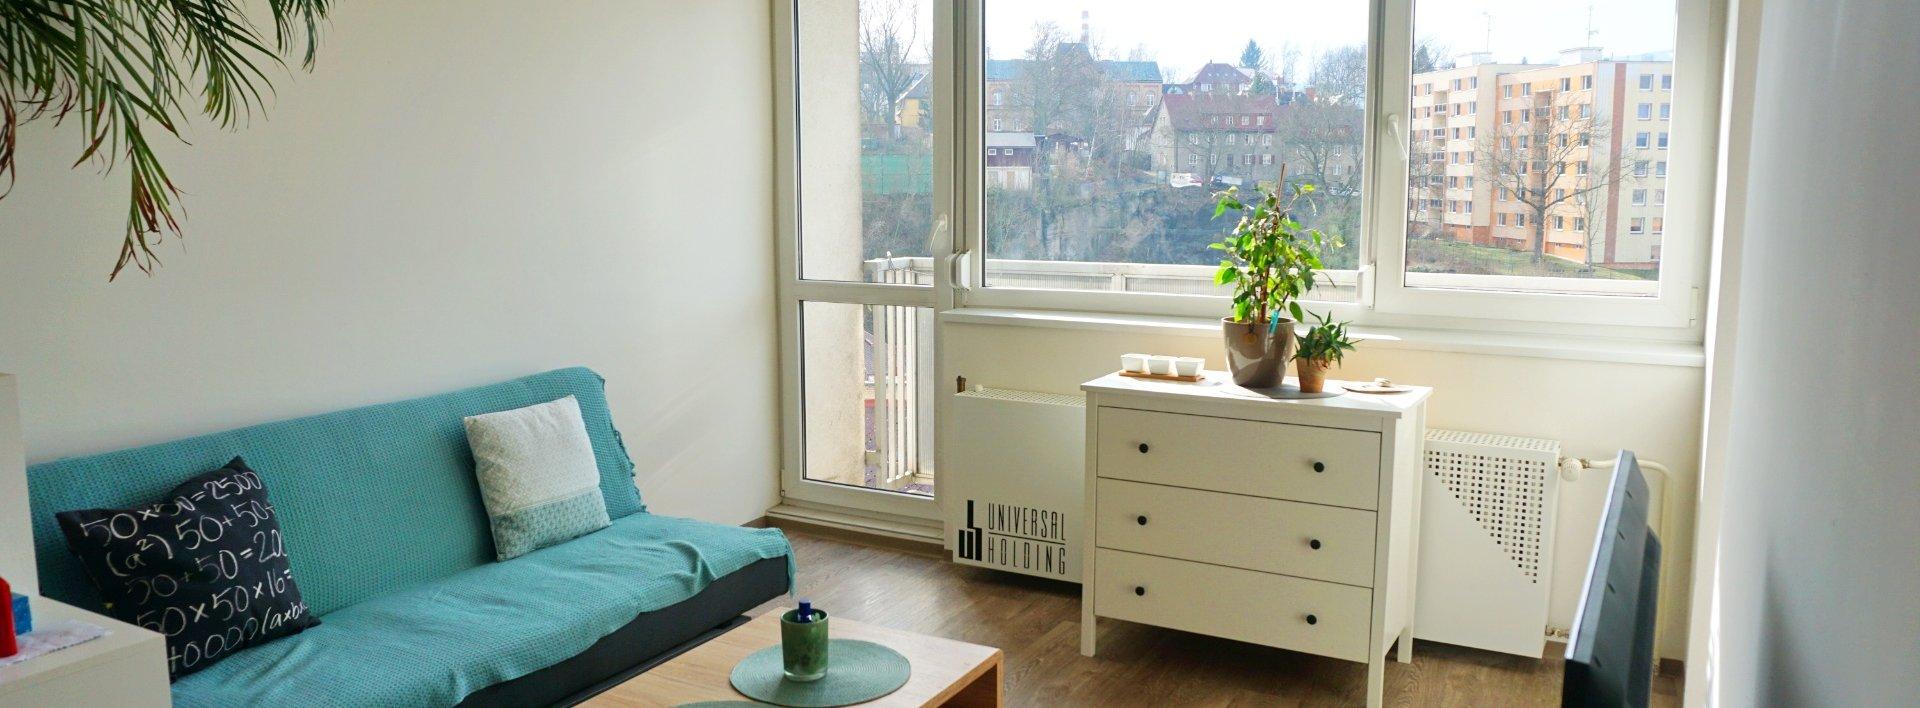 Pronájem pěkného slunného 1+kk s lodžií, 27 m² - Liberec IV-Perštýn, Ev.č.: N49182